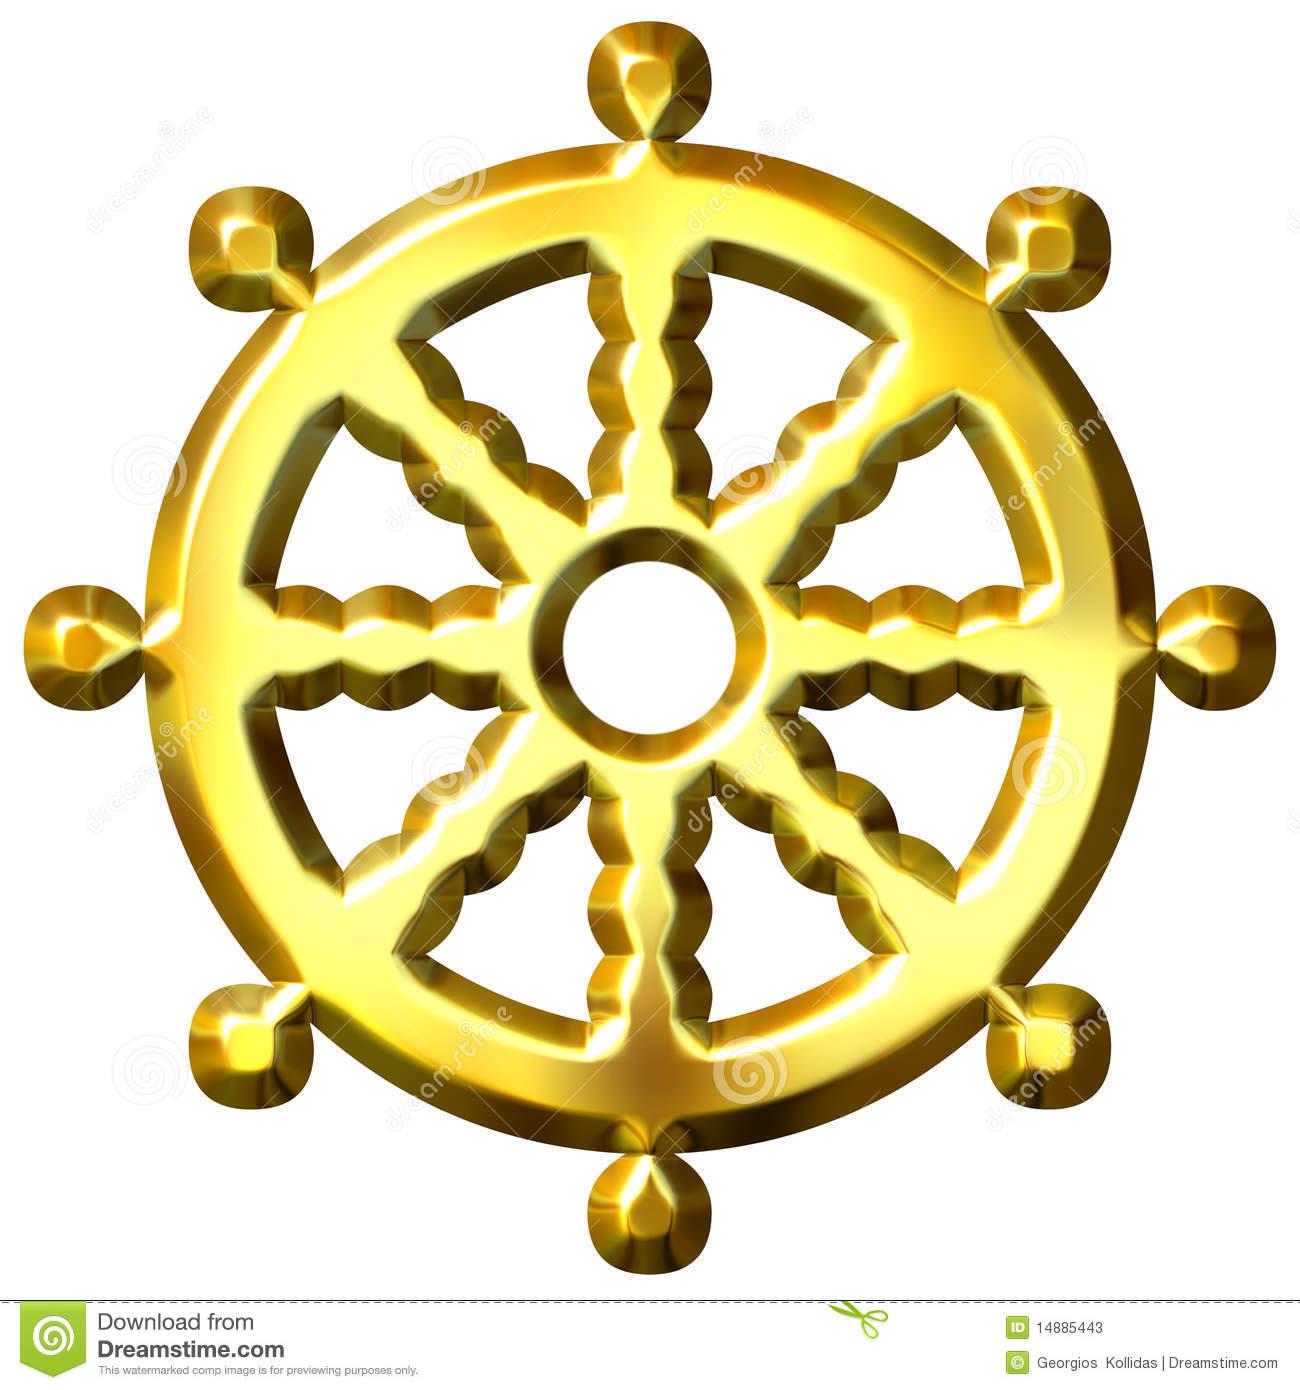 The diamond sutra volumes 16 32 by michael todd michael todd 3d golden buddhism symbol wheel dharma 14885443 biocorpaavc